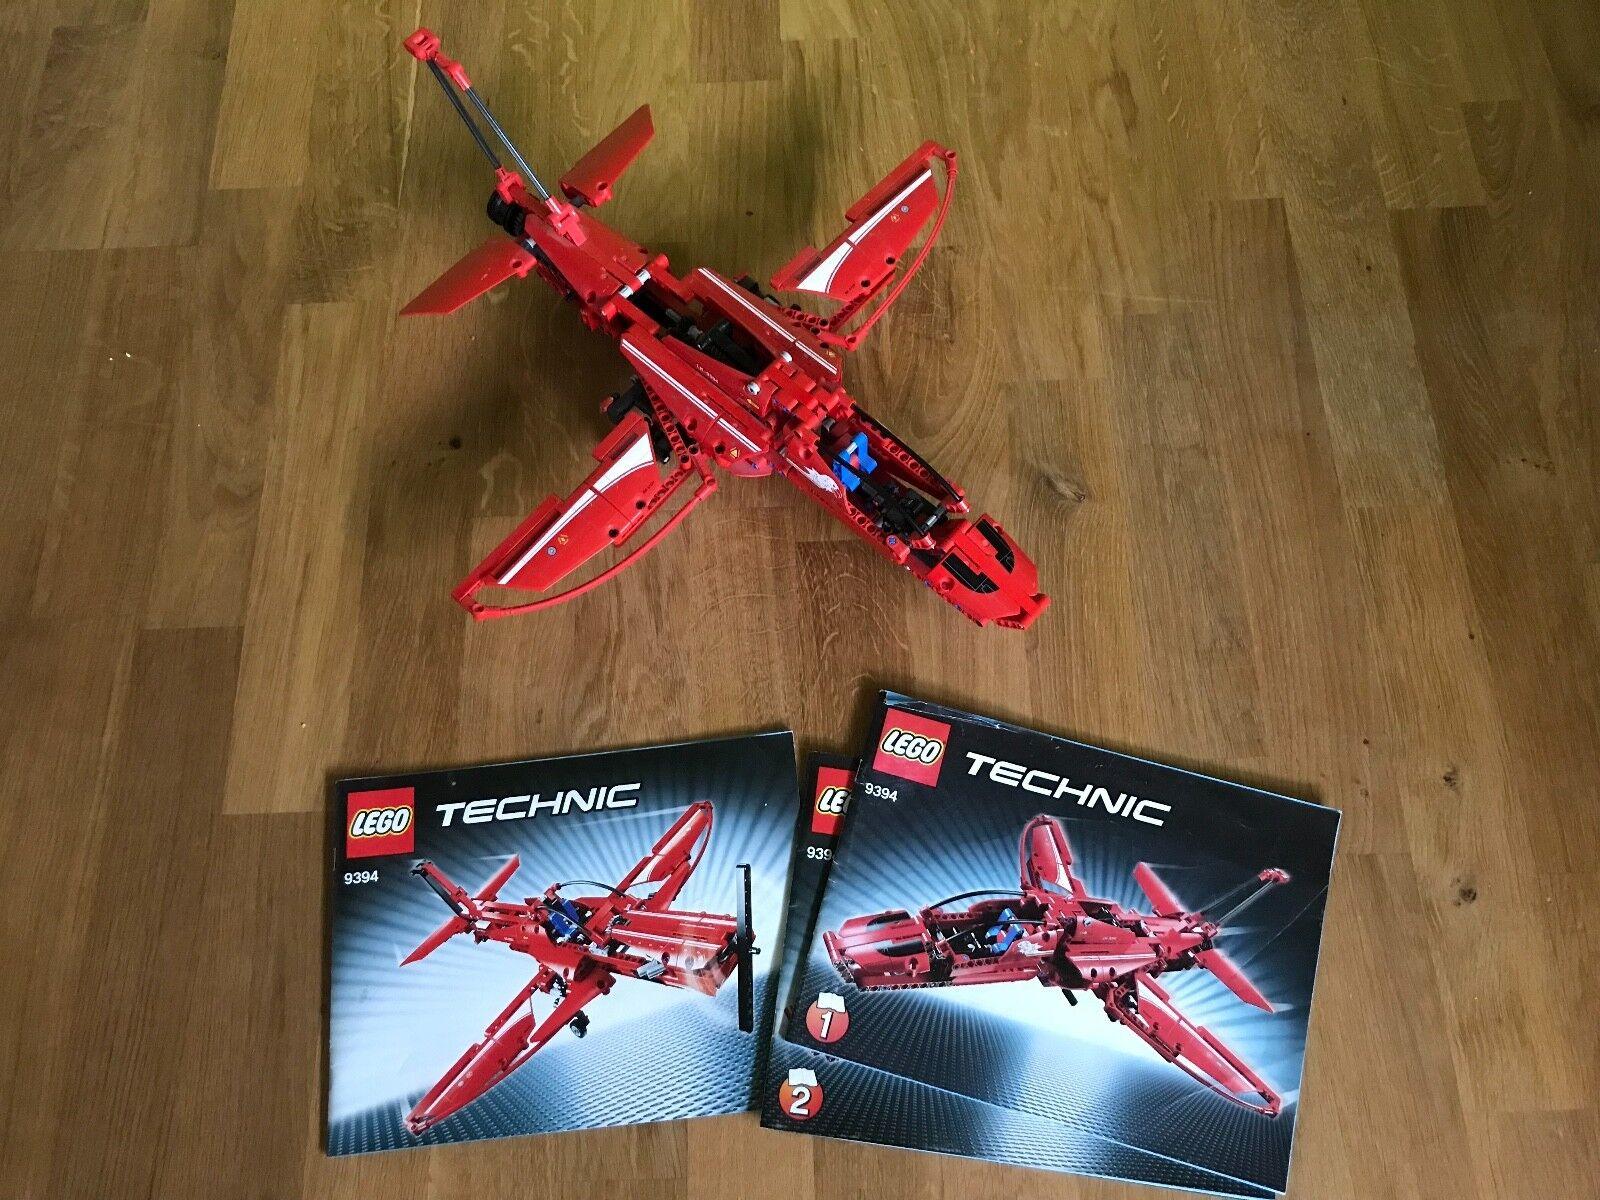 LEGO TECHNIC 9394 Flieger rot 2 in in in 1 Modell gebraucht komplett zerlegt 5b342d